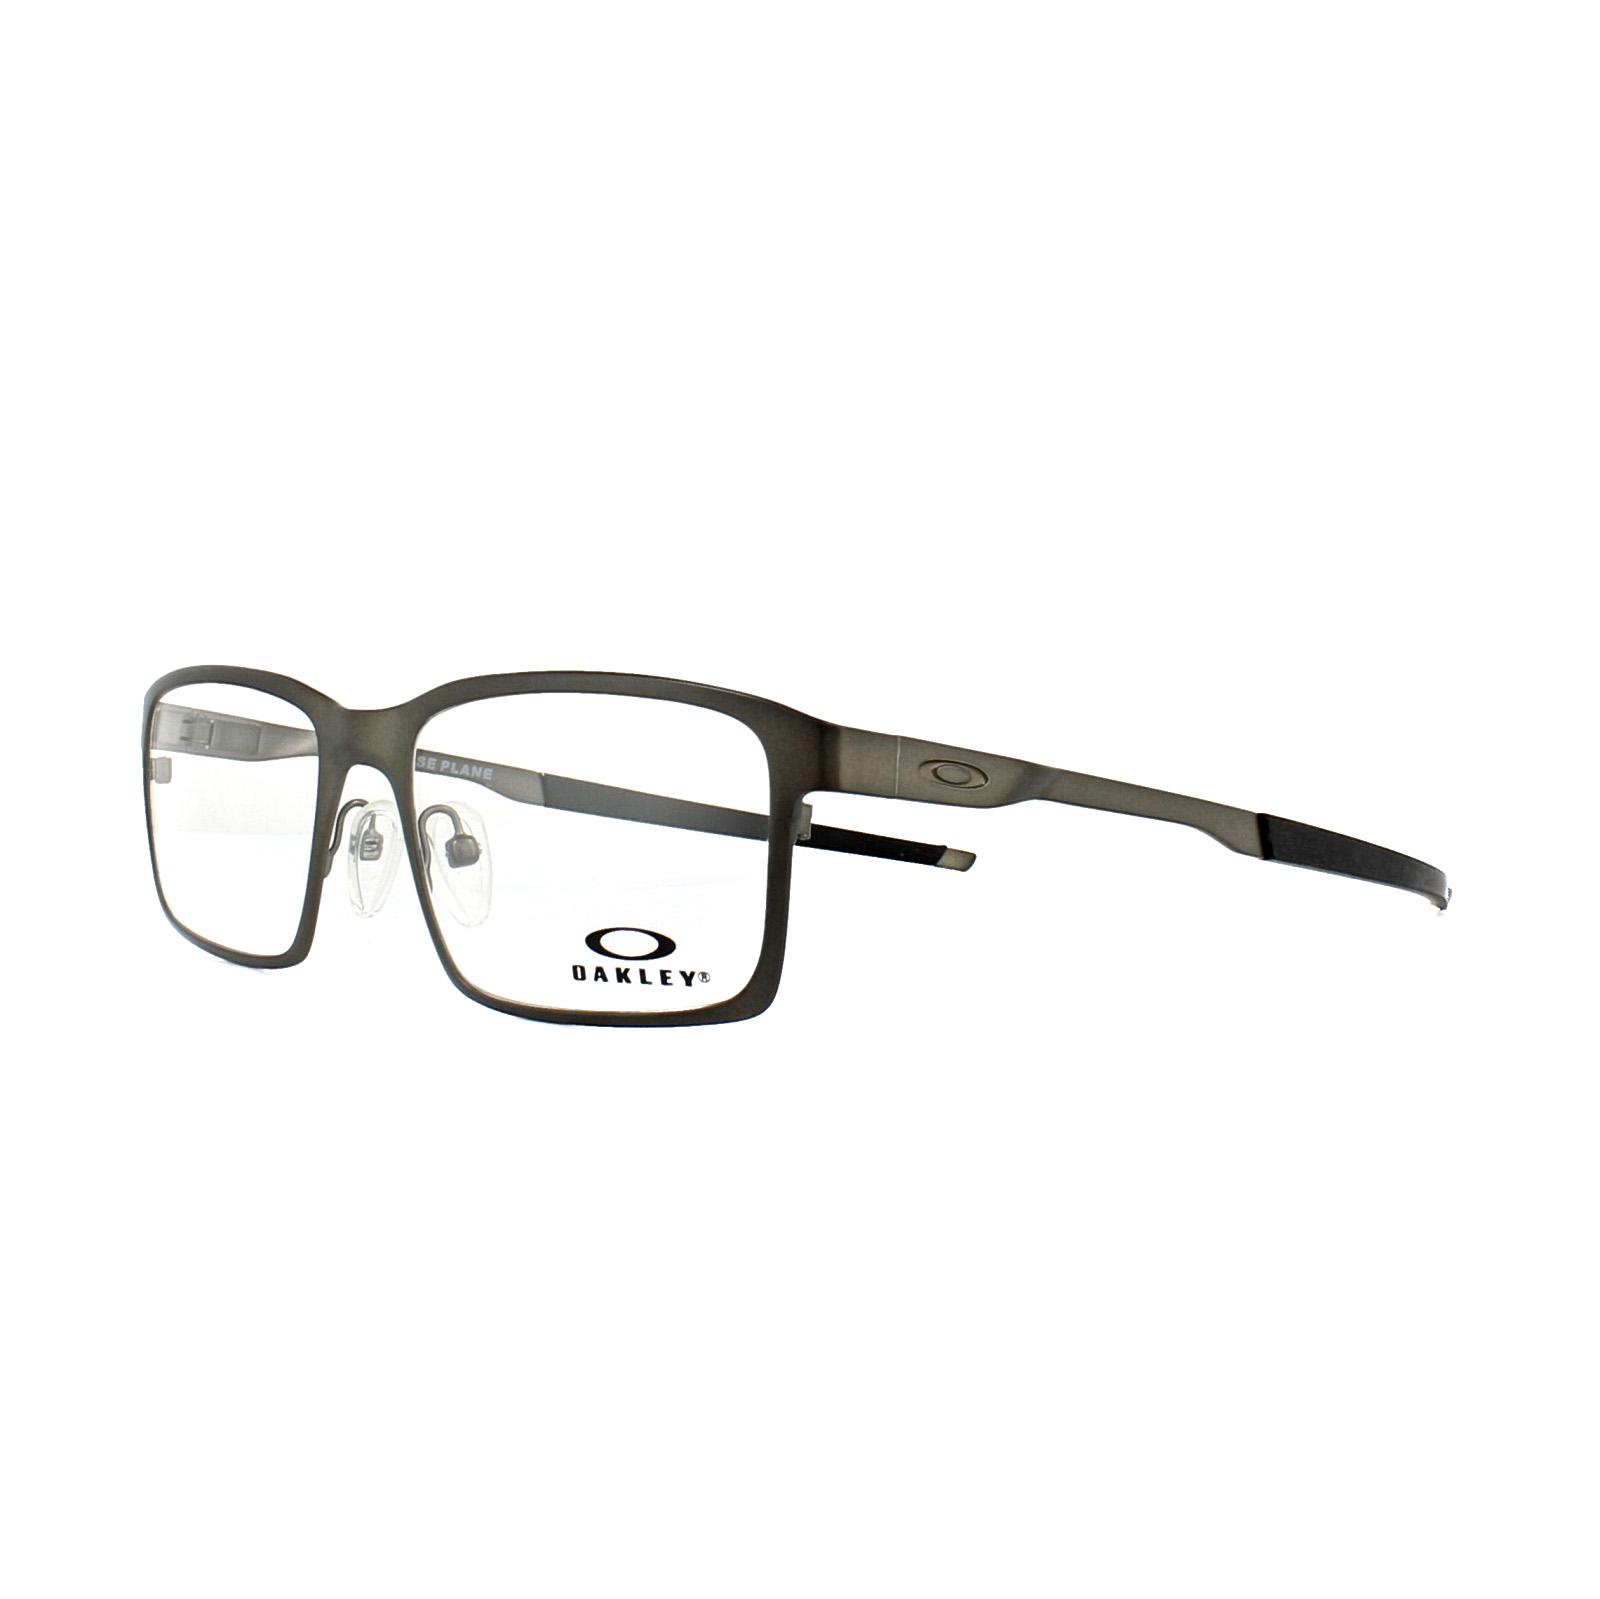 70f274b40667 Sentinel Oakley Glasses Frames Base Plane OX3232-03 Cement 52mm Mens